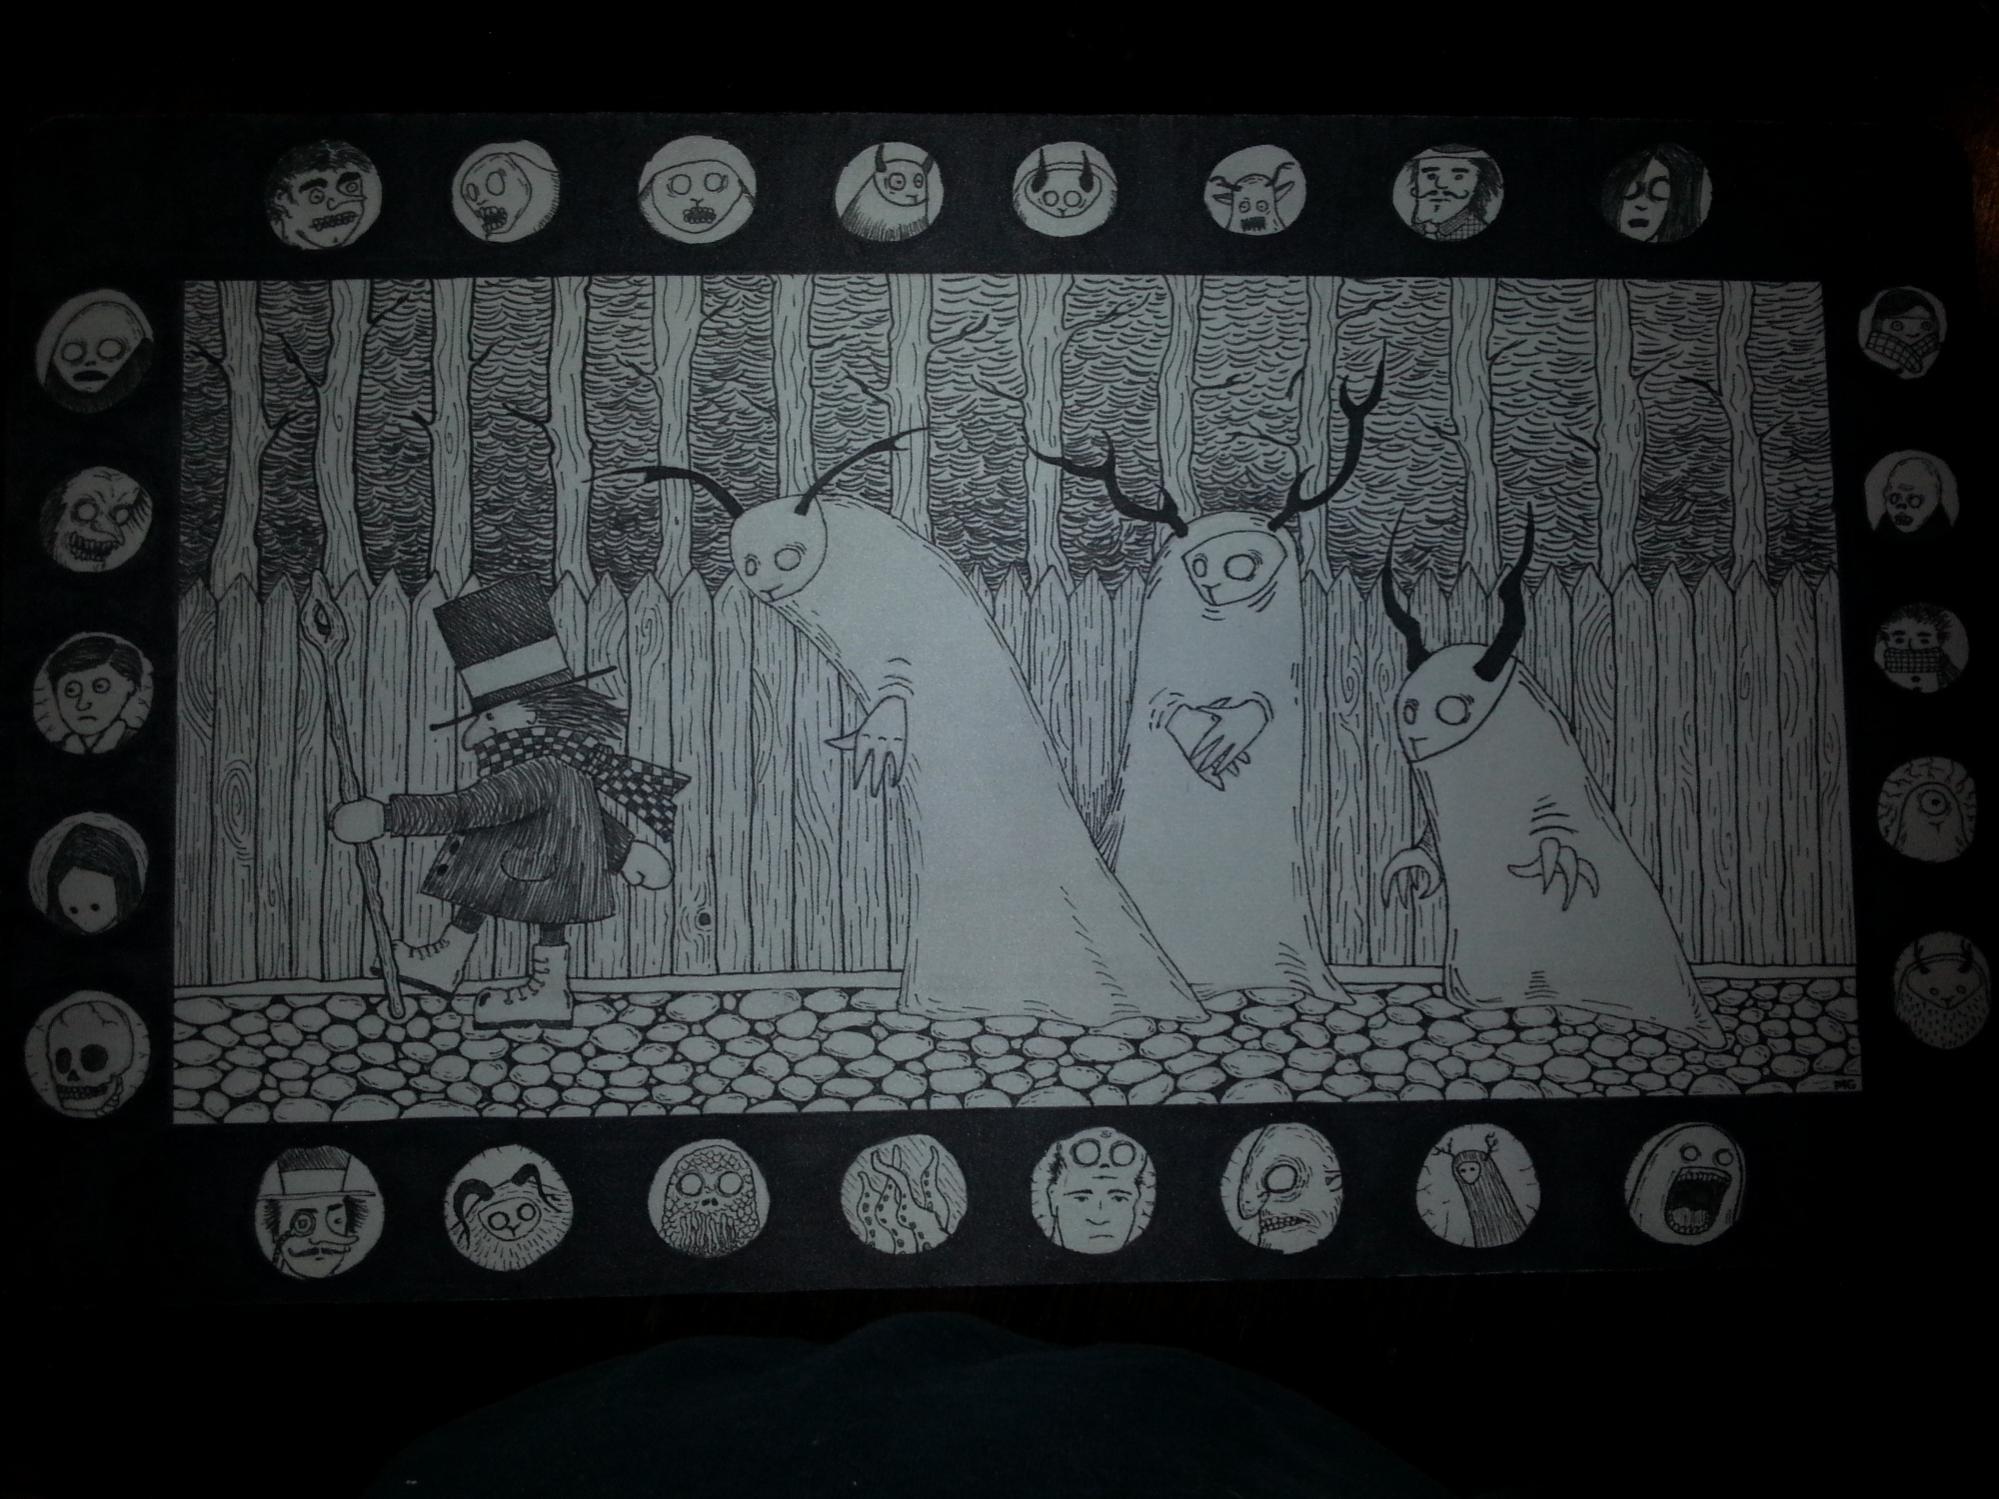 Show Us The Best Edh Playmat Art You Ve Ever Seen